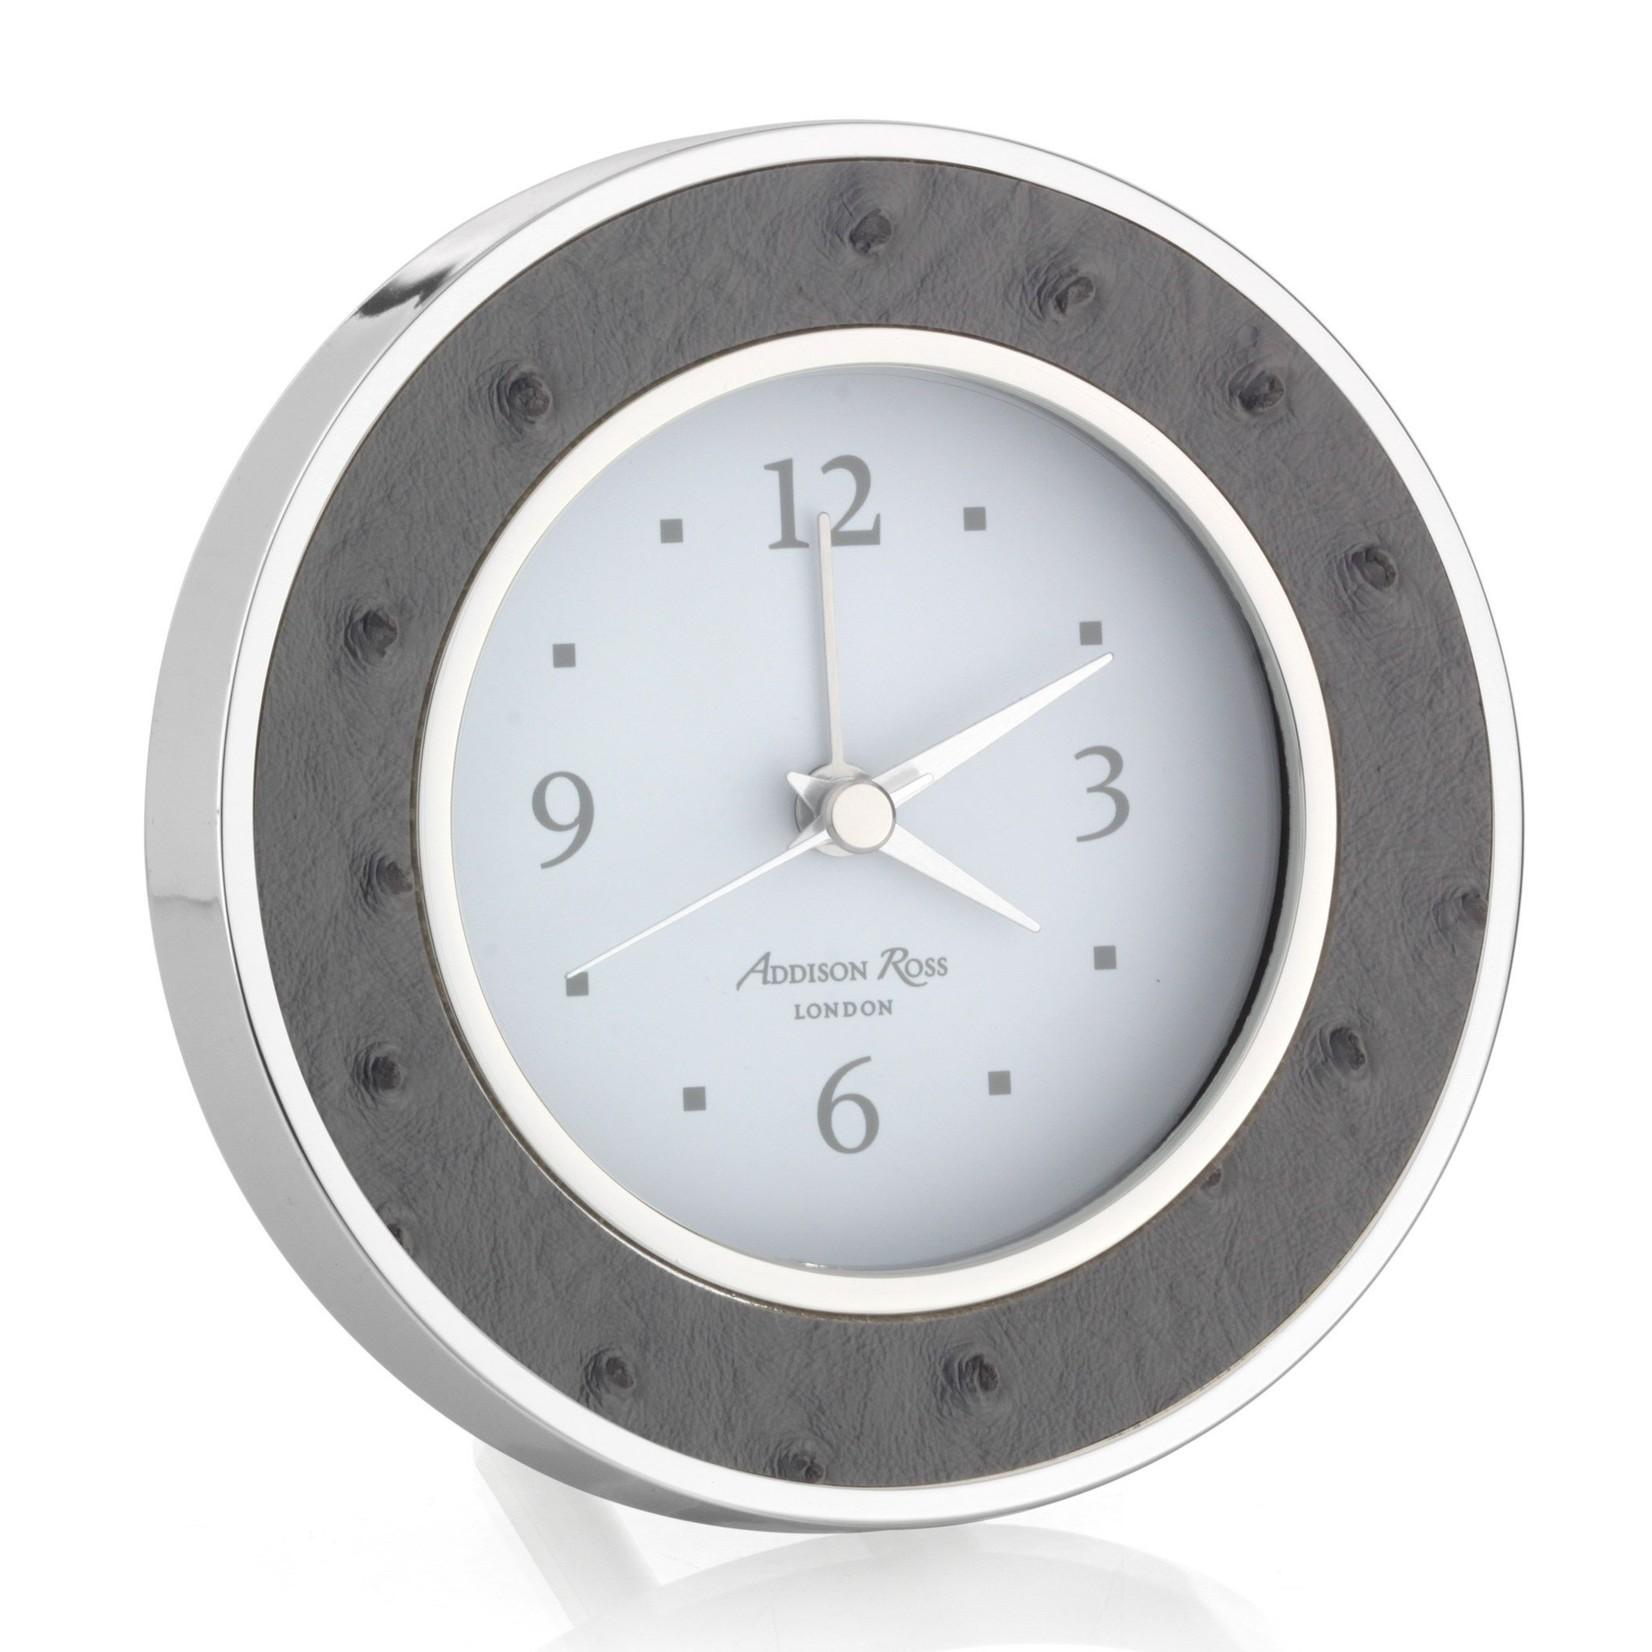 Addison Ross Round Alarm Clock